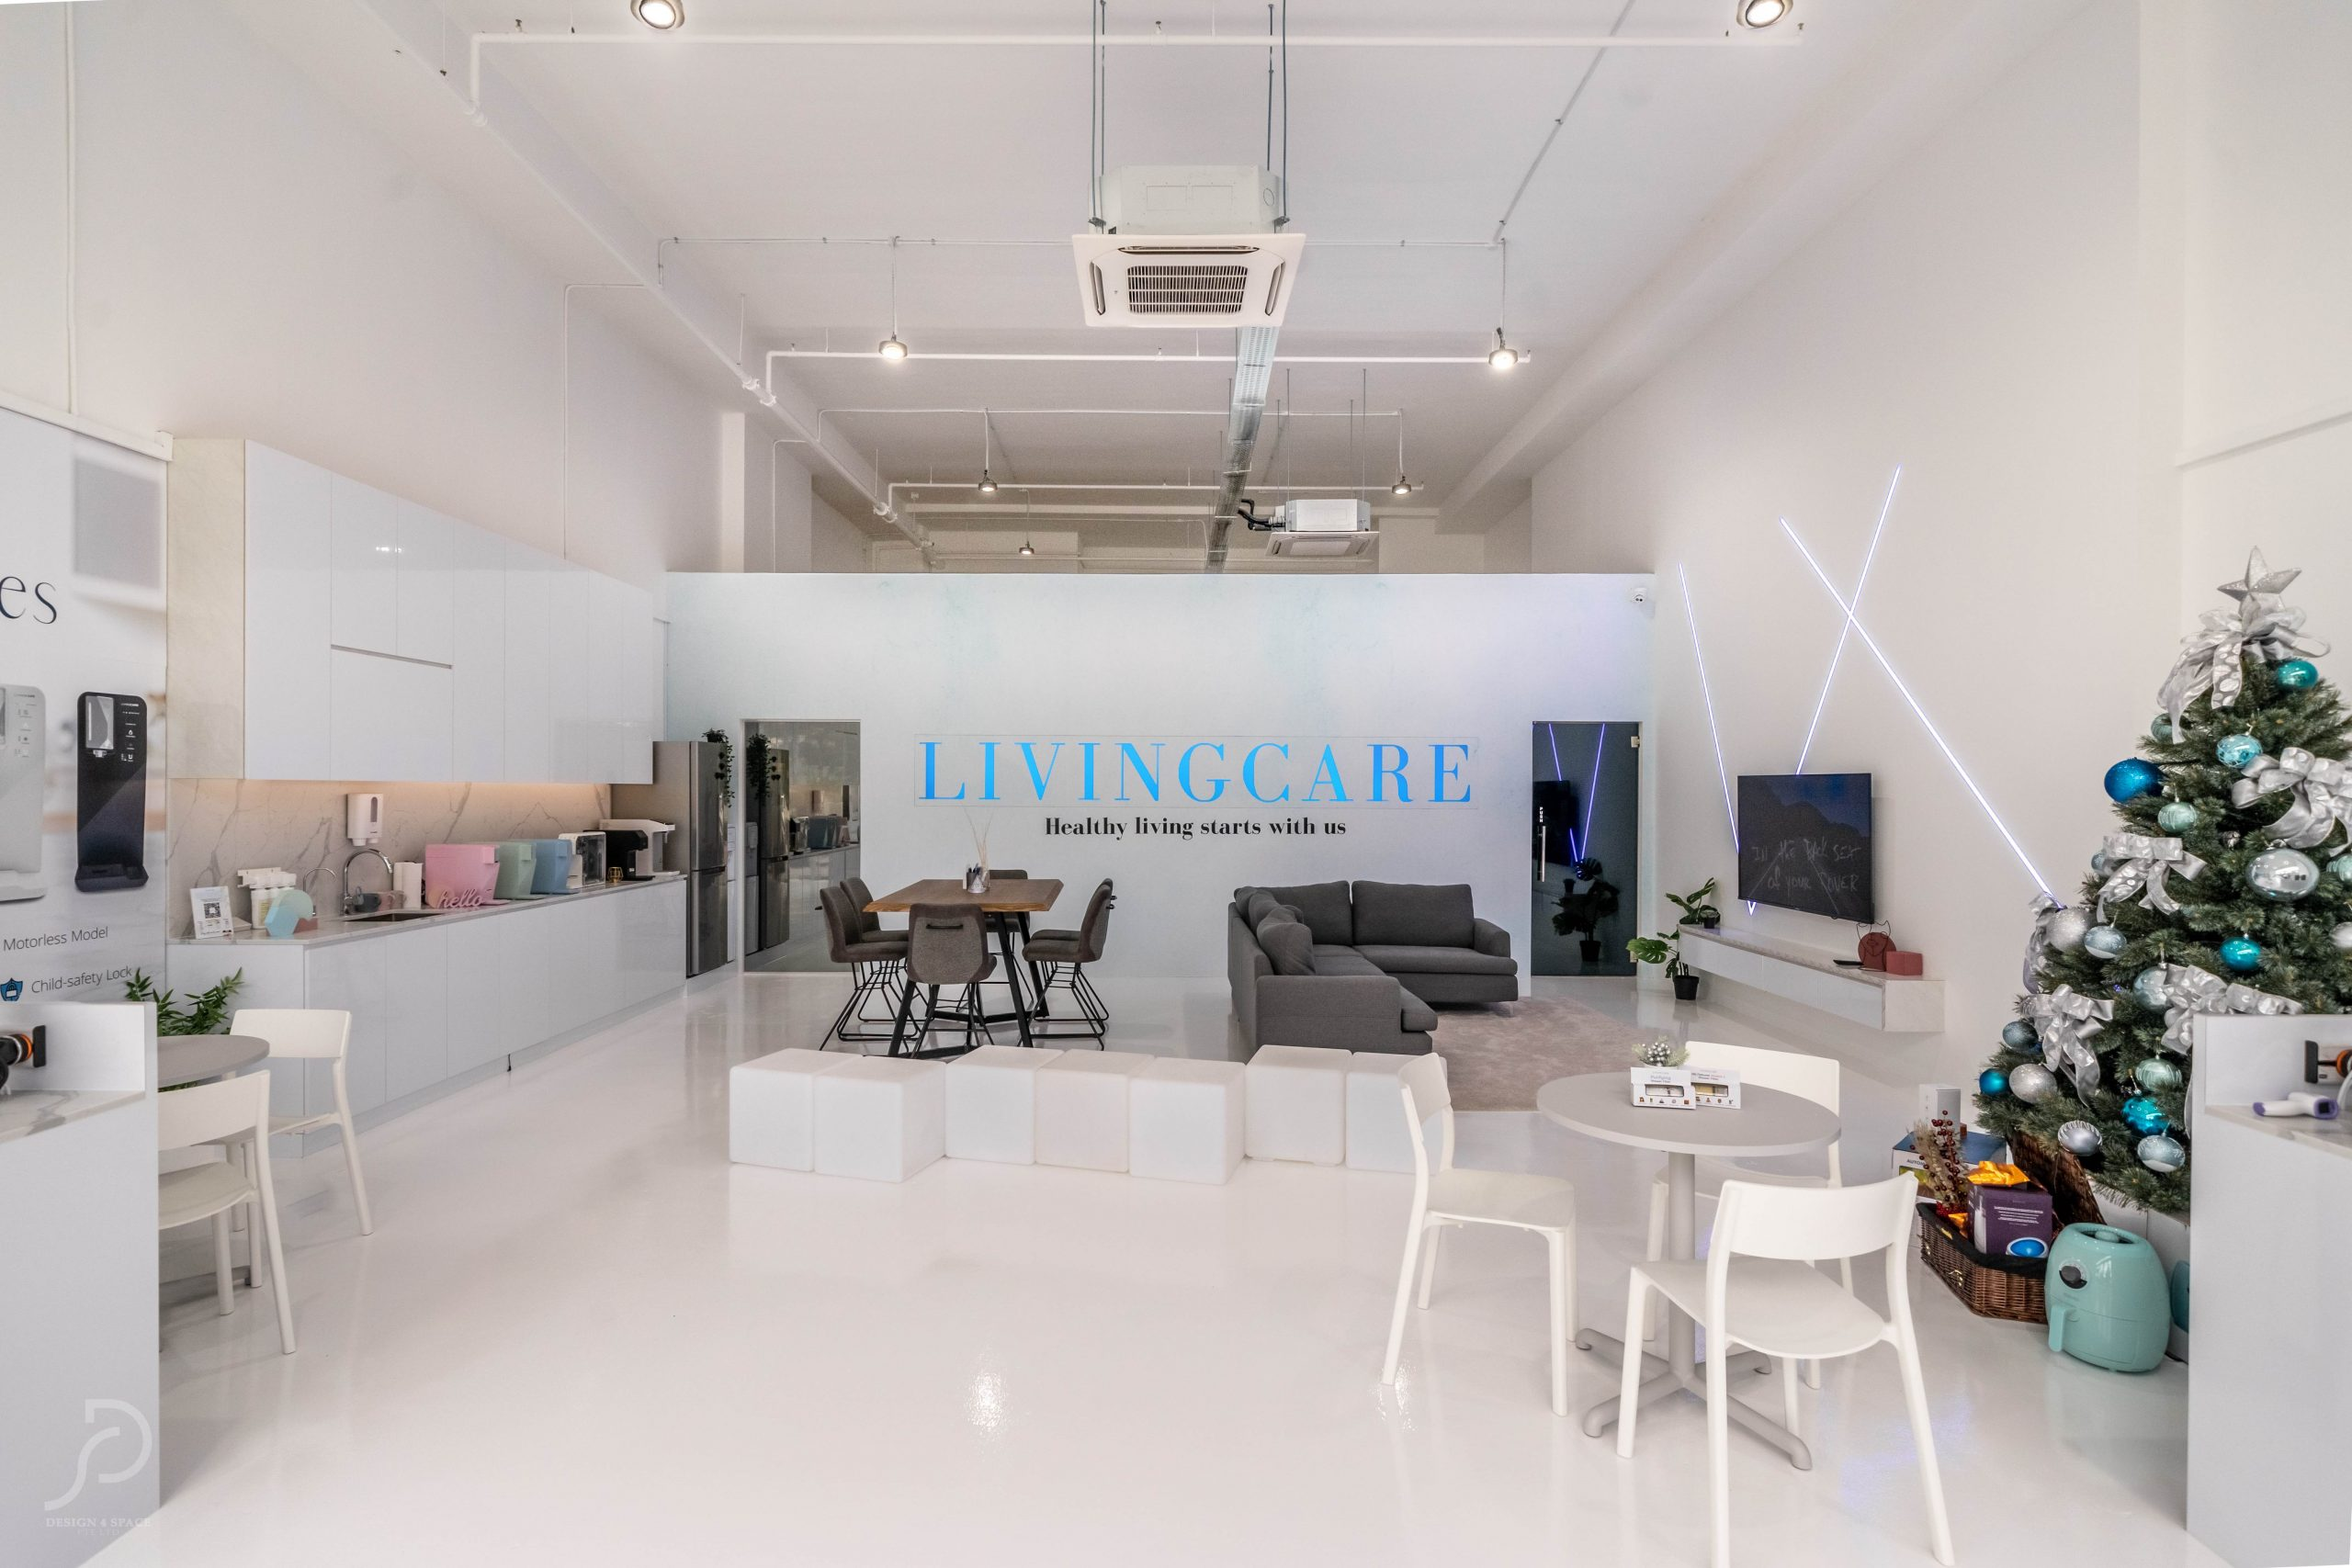 Living care1